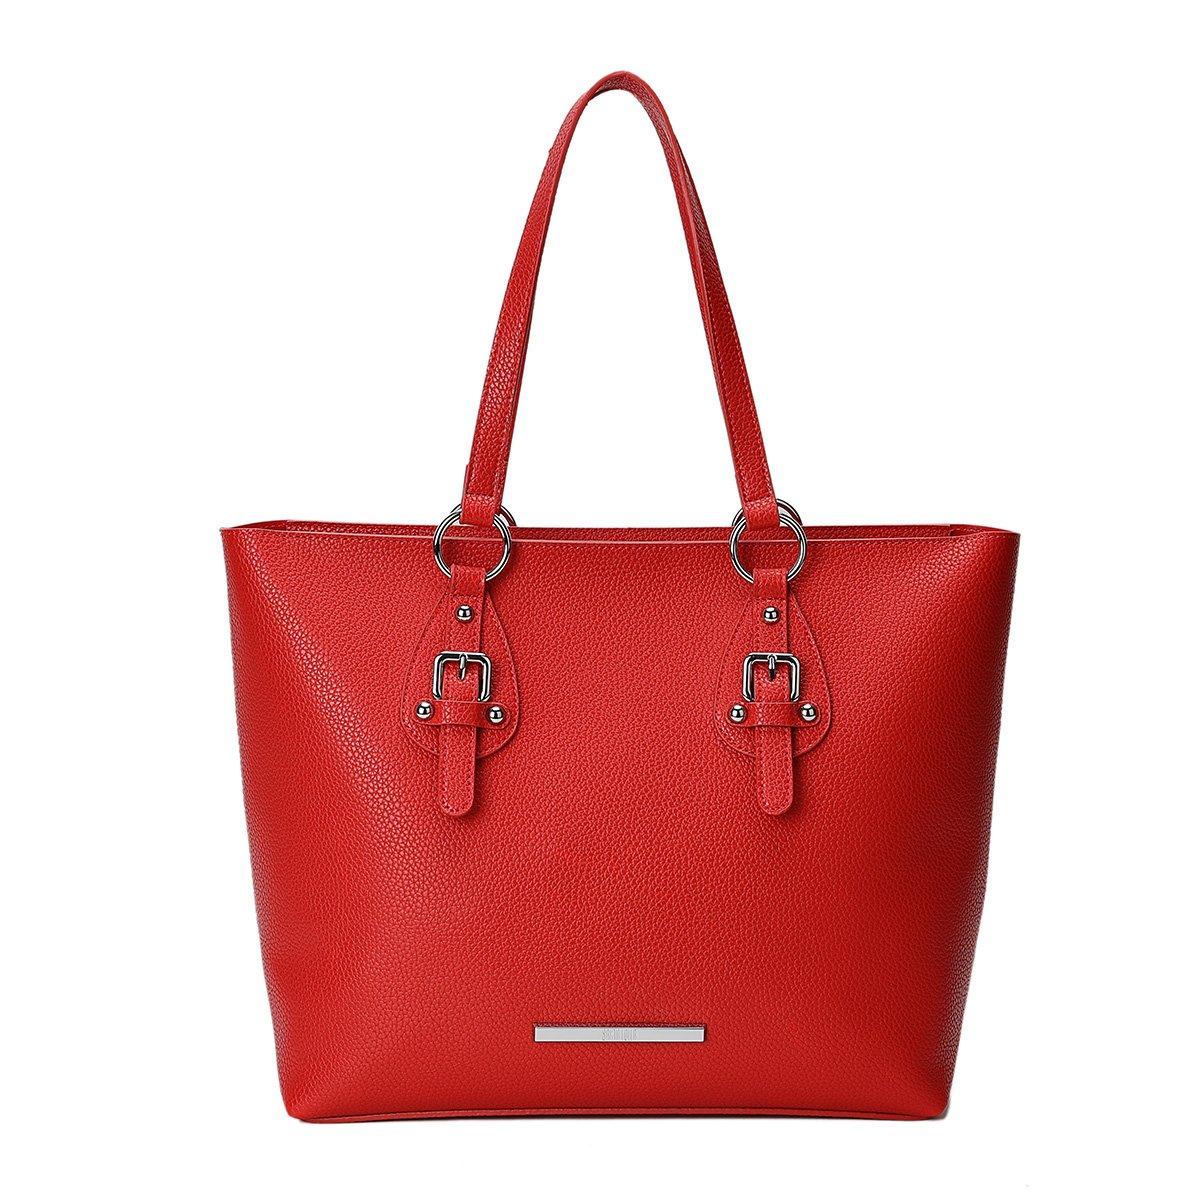 Bolsa Shopper Foater Fivela Vermelha - Santa Lolla